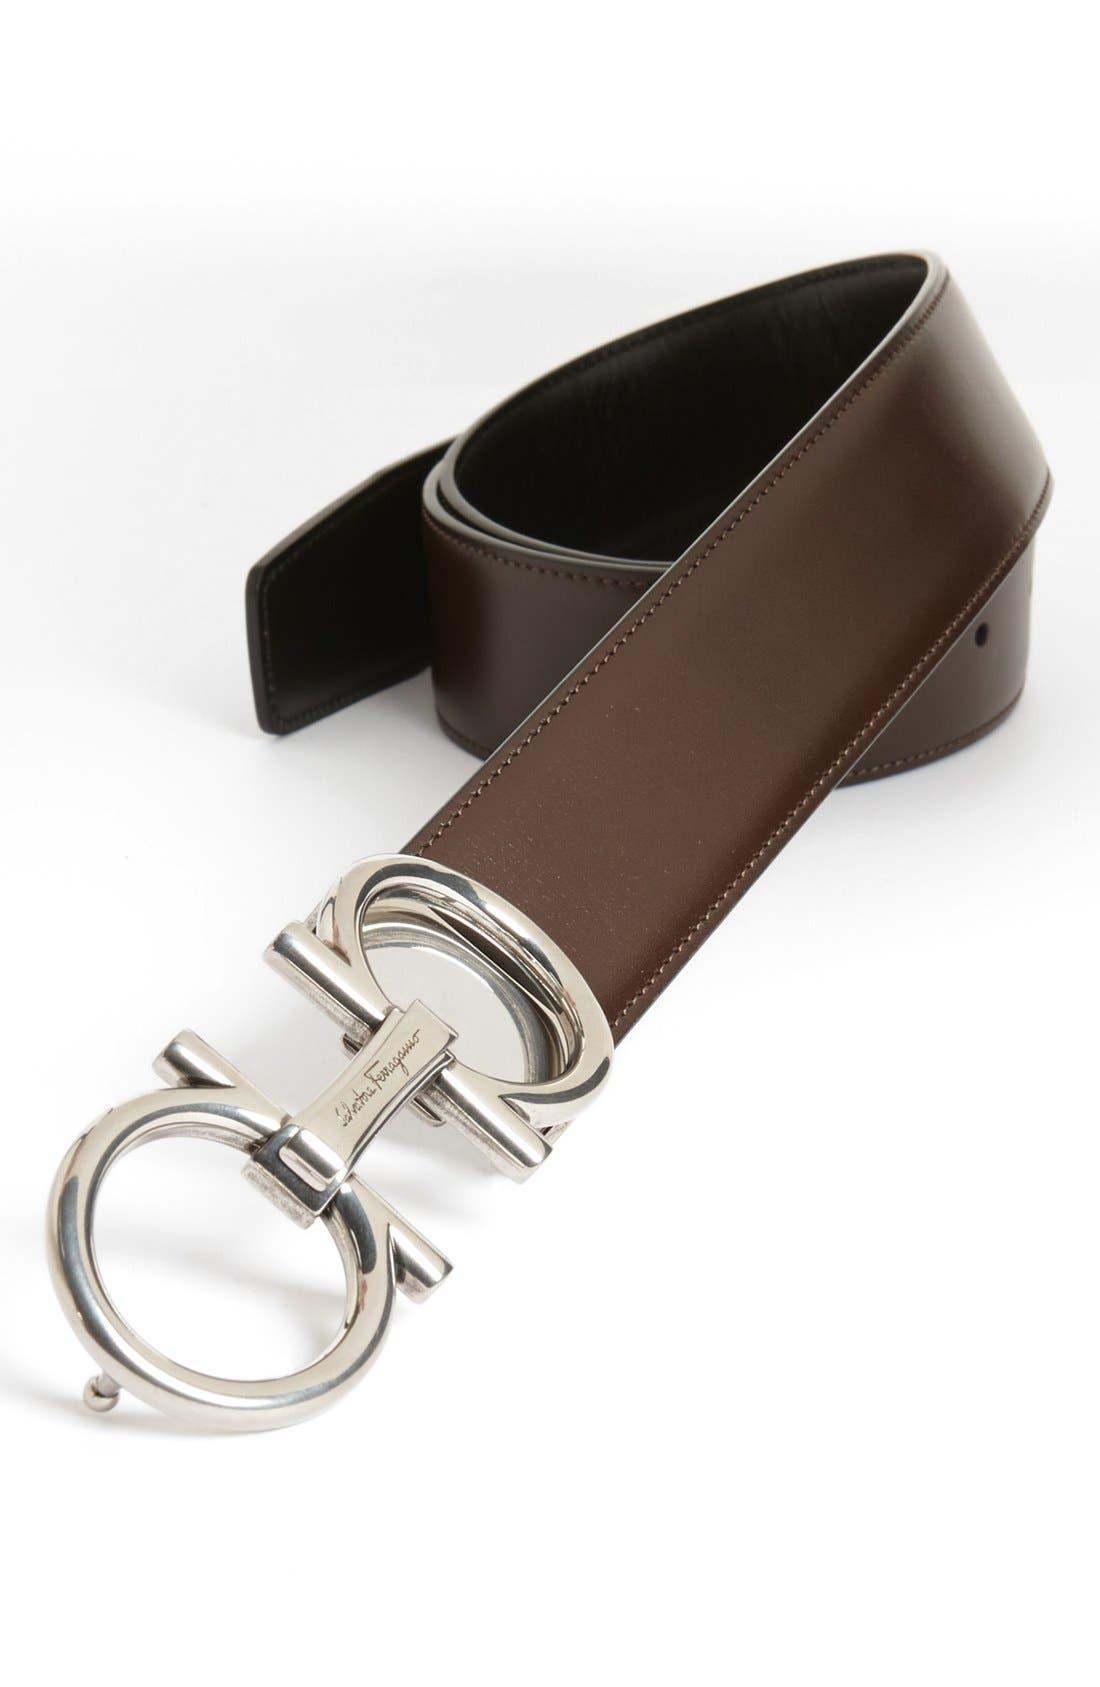 Alternate Image 1 Selected - Salvatore Ferragamo Double Gancio Reversible Leather Belt